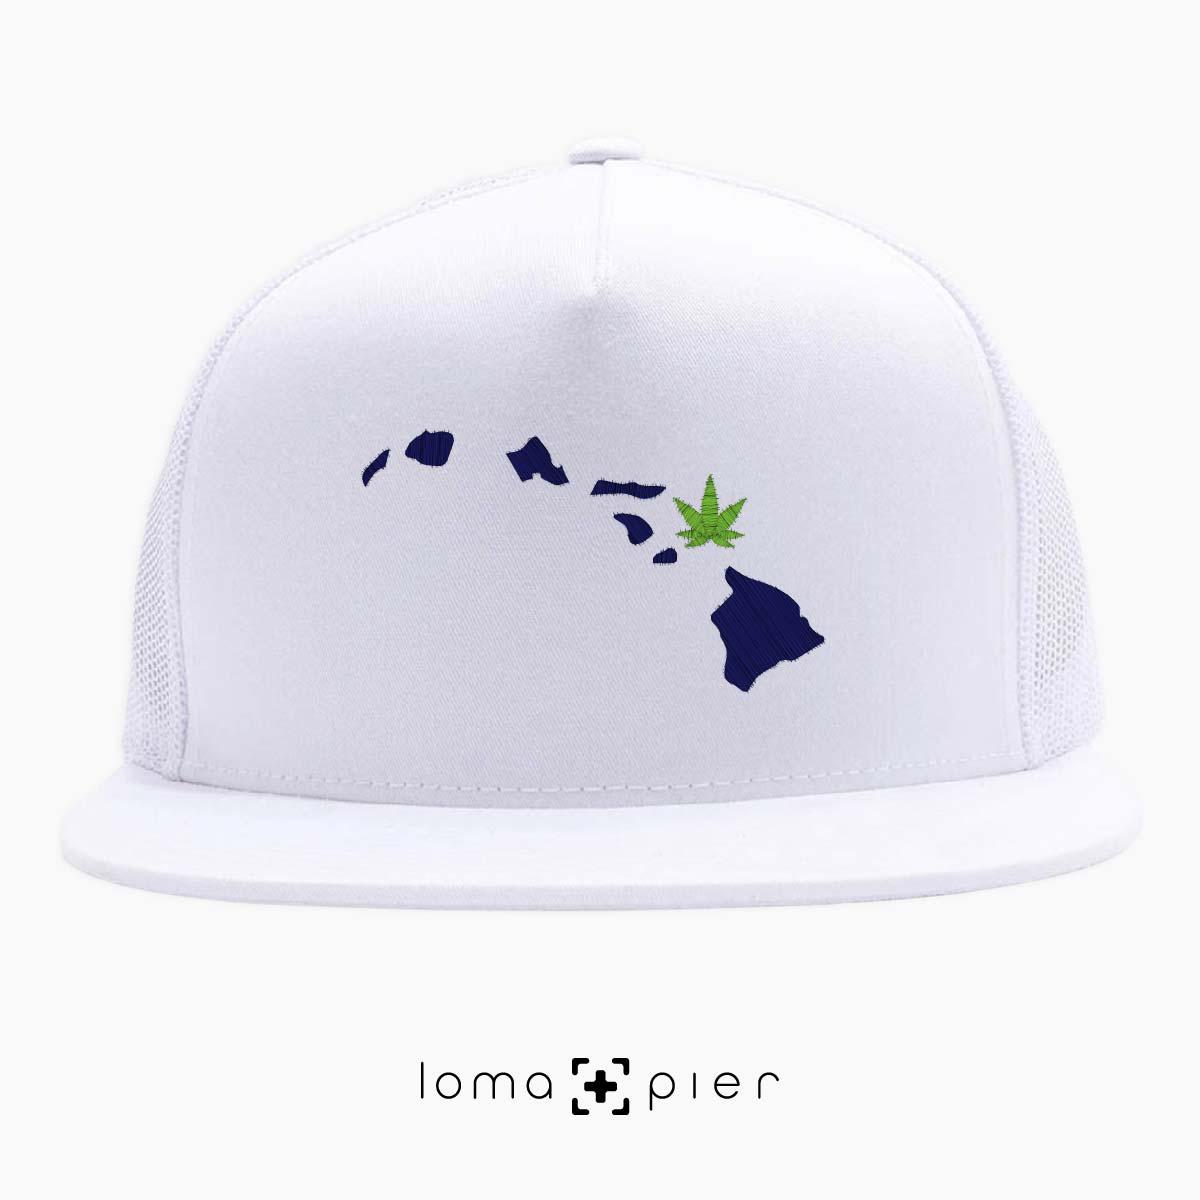 MAUI-juana hawaii weed beach netback hat by loma+pier hat shop